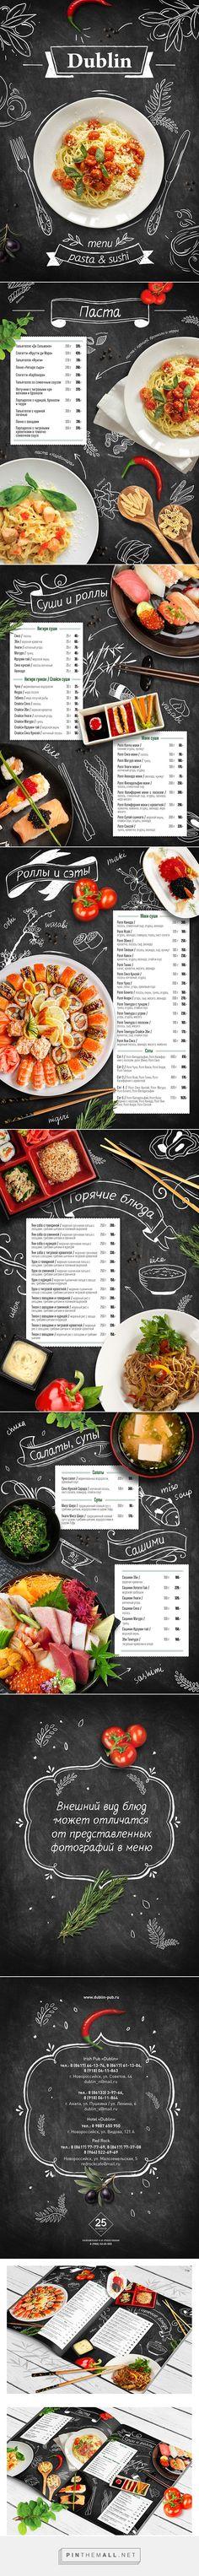 shushi&pasta menu on Behance  https://www.behance.net/gallery/22241141/shushi-pasta-menu - created via https://pinthemall.net